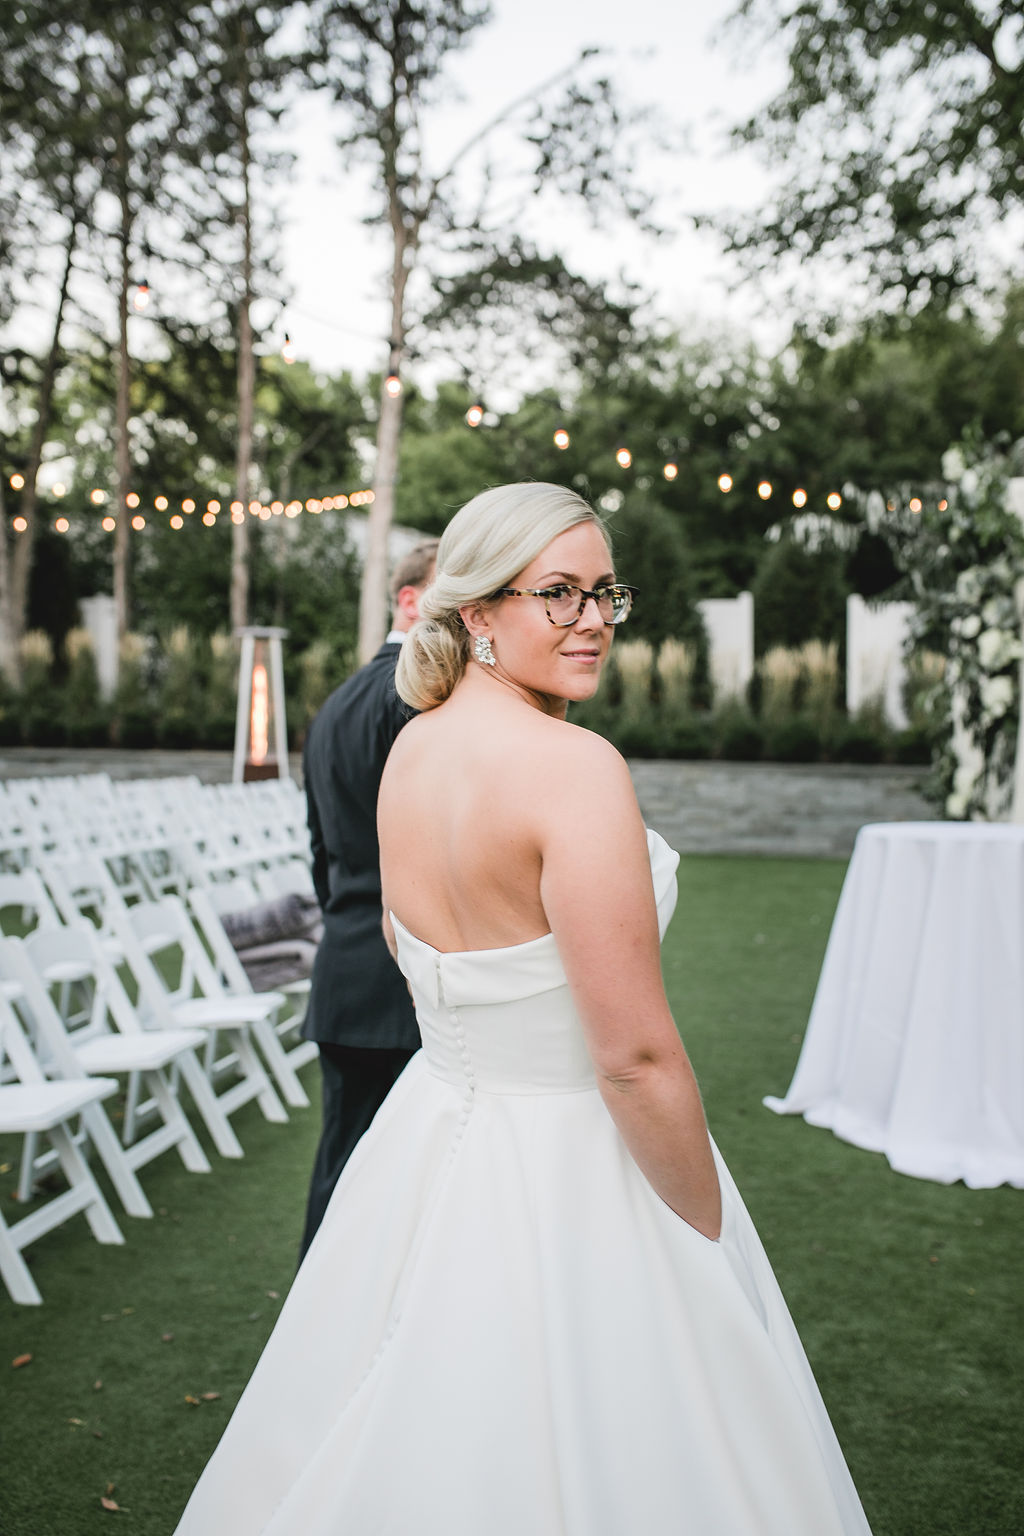 Kelly and Matt | Hutton House | Aqua Fox Photography | Sixpence Events and Planning Minnesota Wedding Planner104.jpg